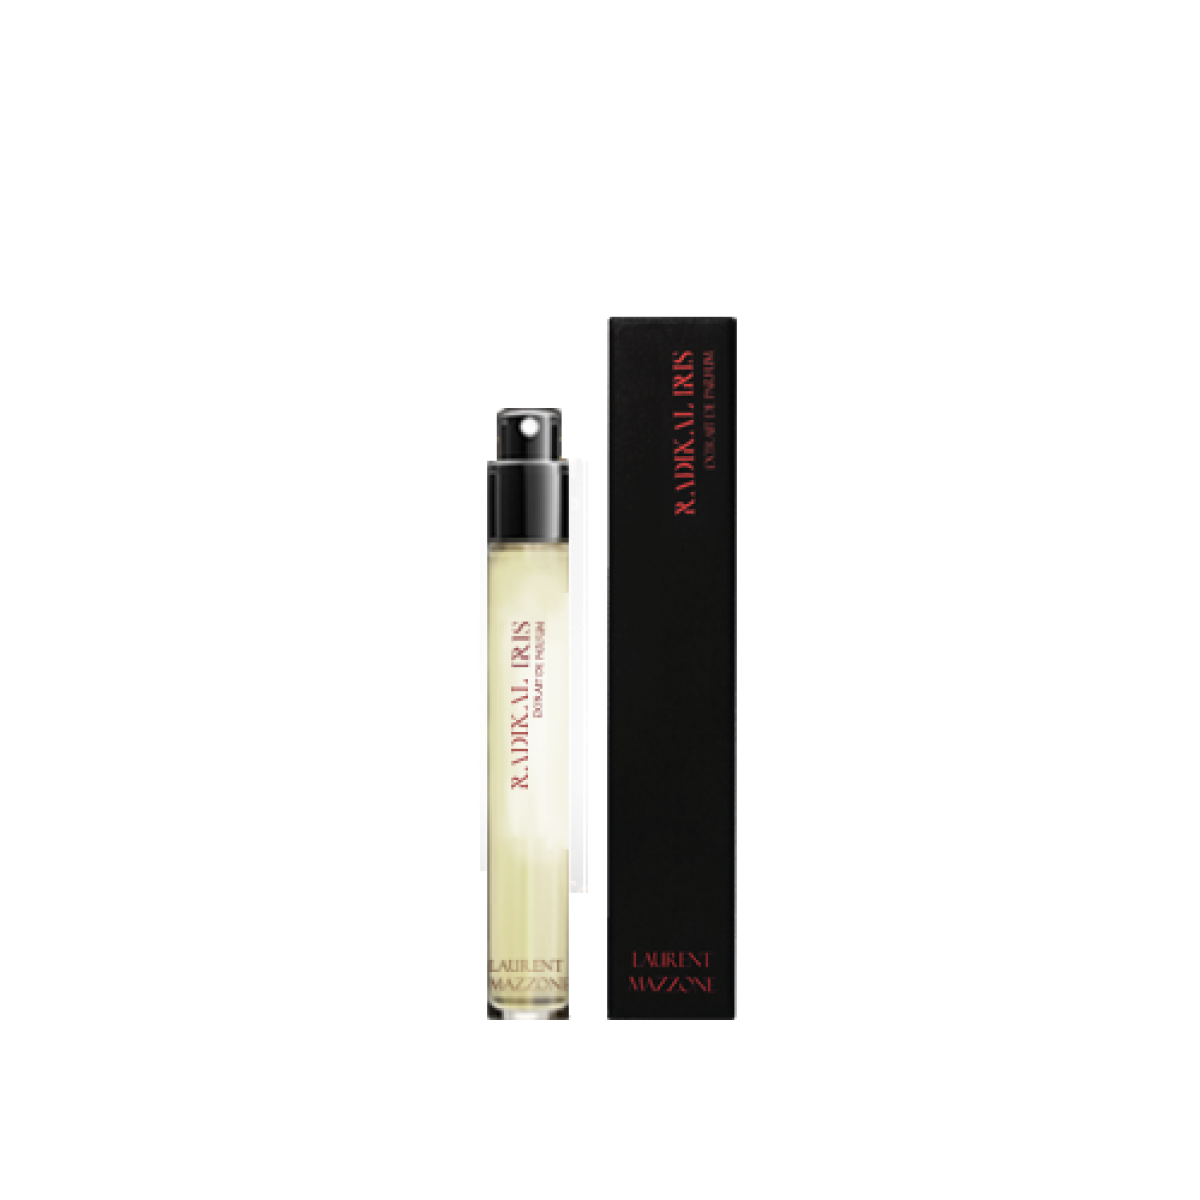 RADIKAL IRIS - LM Parfums